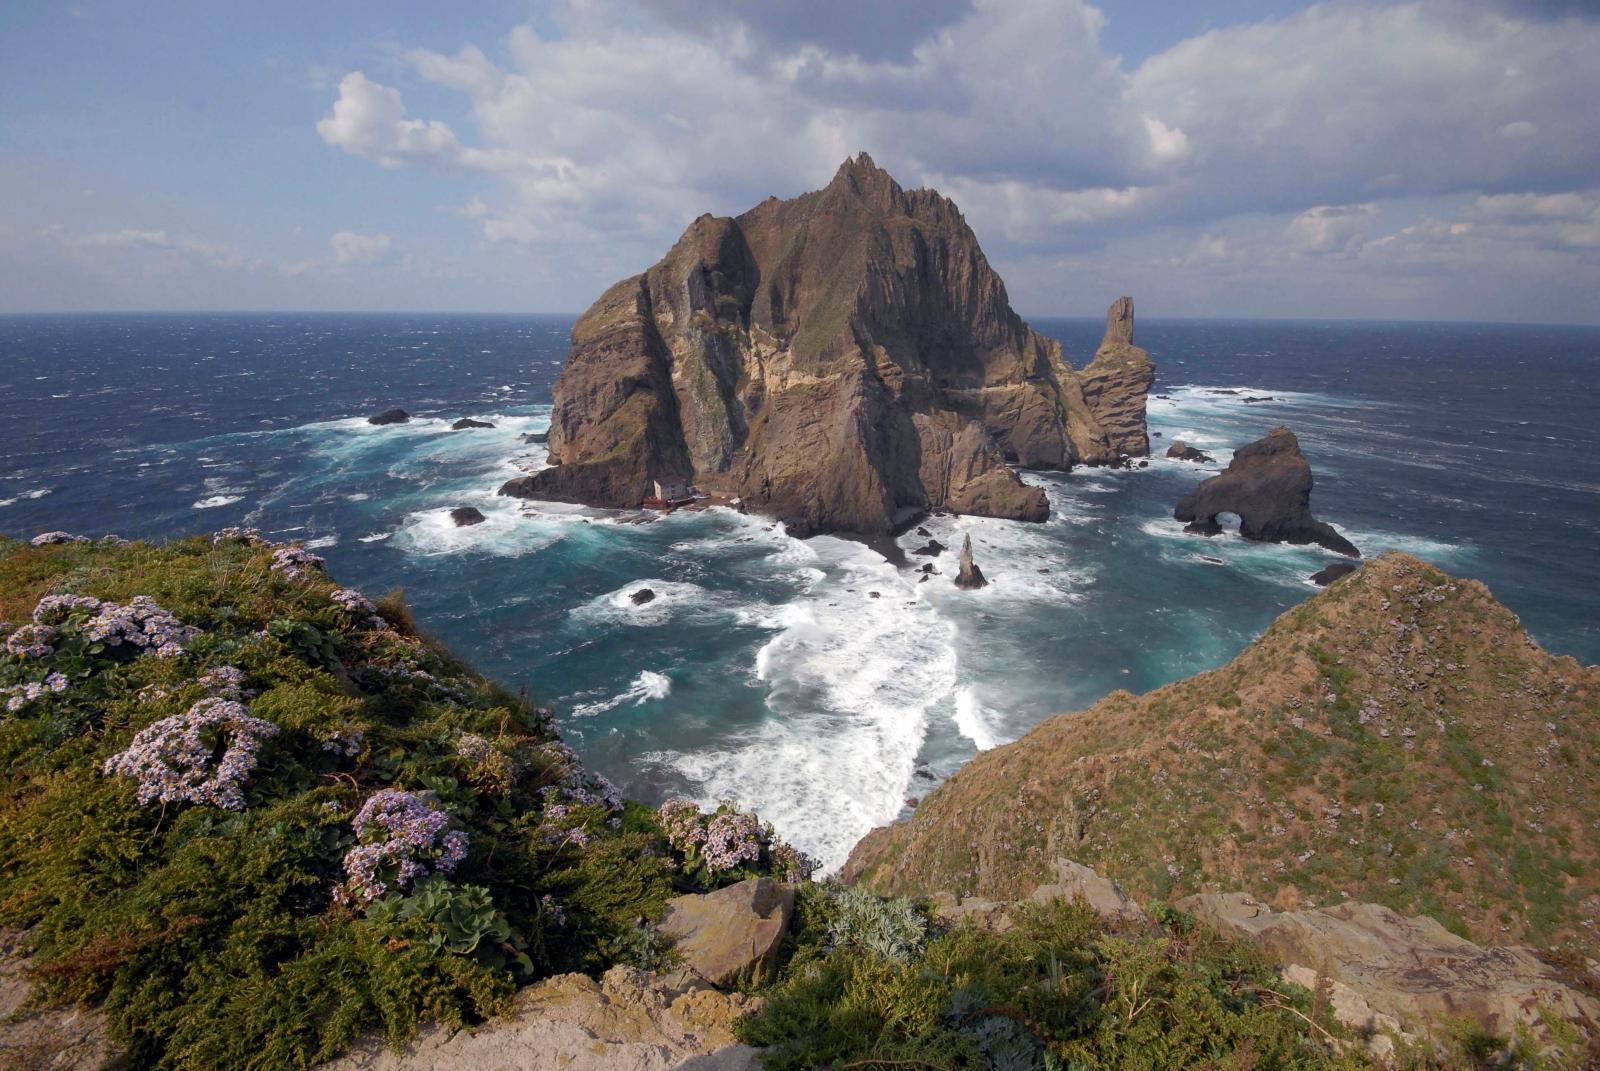 Japan slams Pyeongchang mention of disputed islands